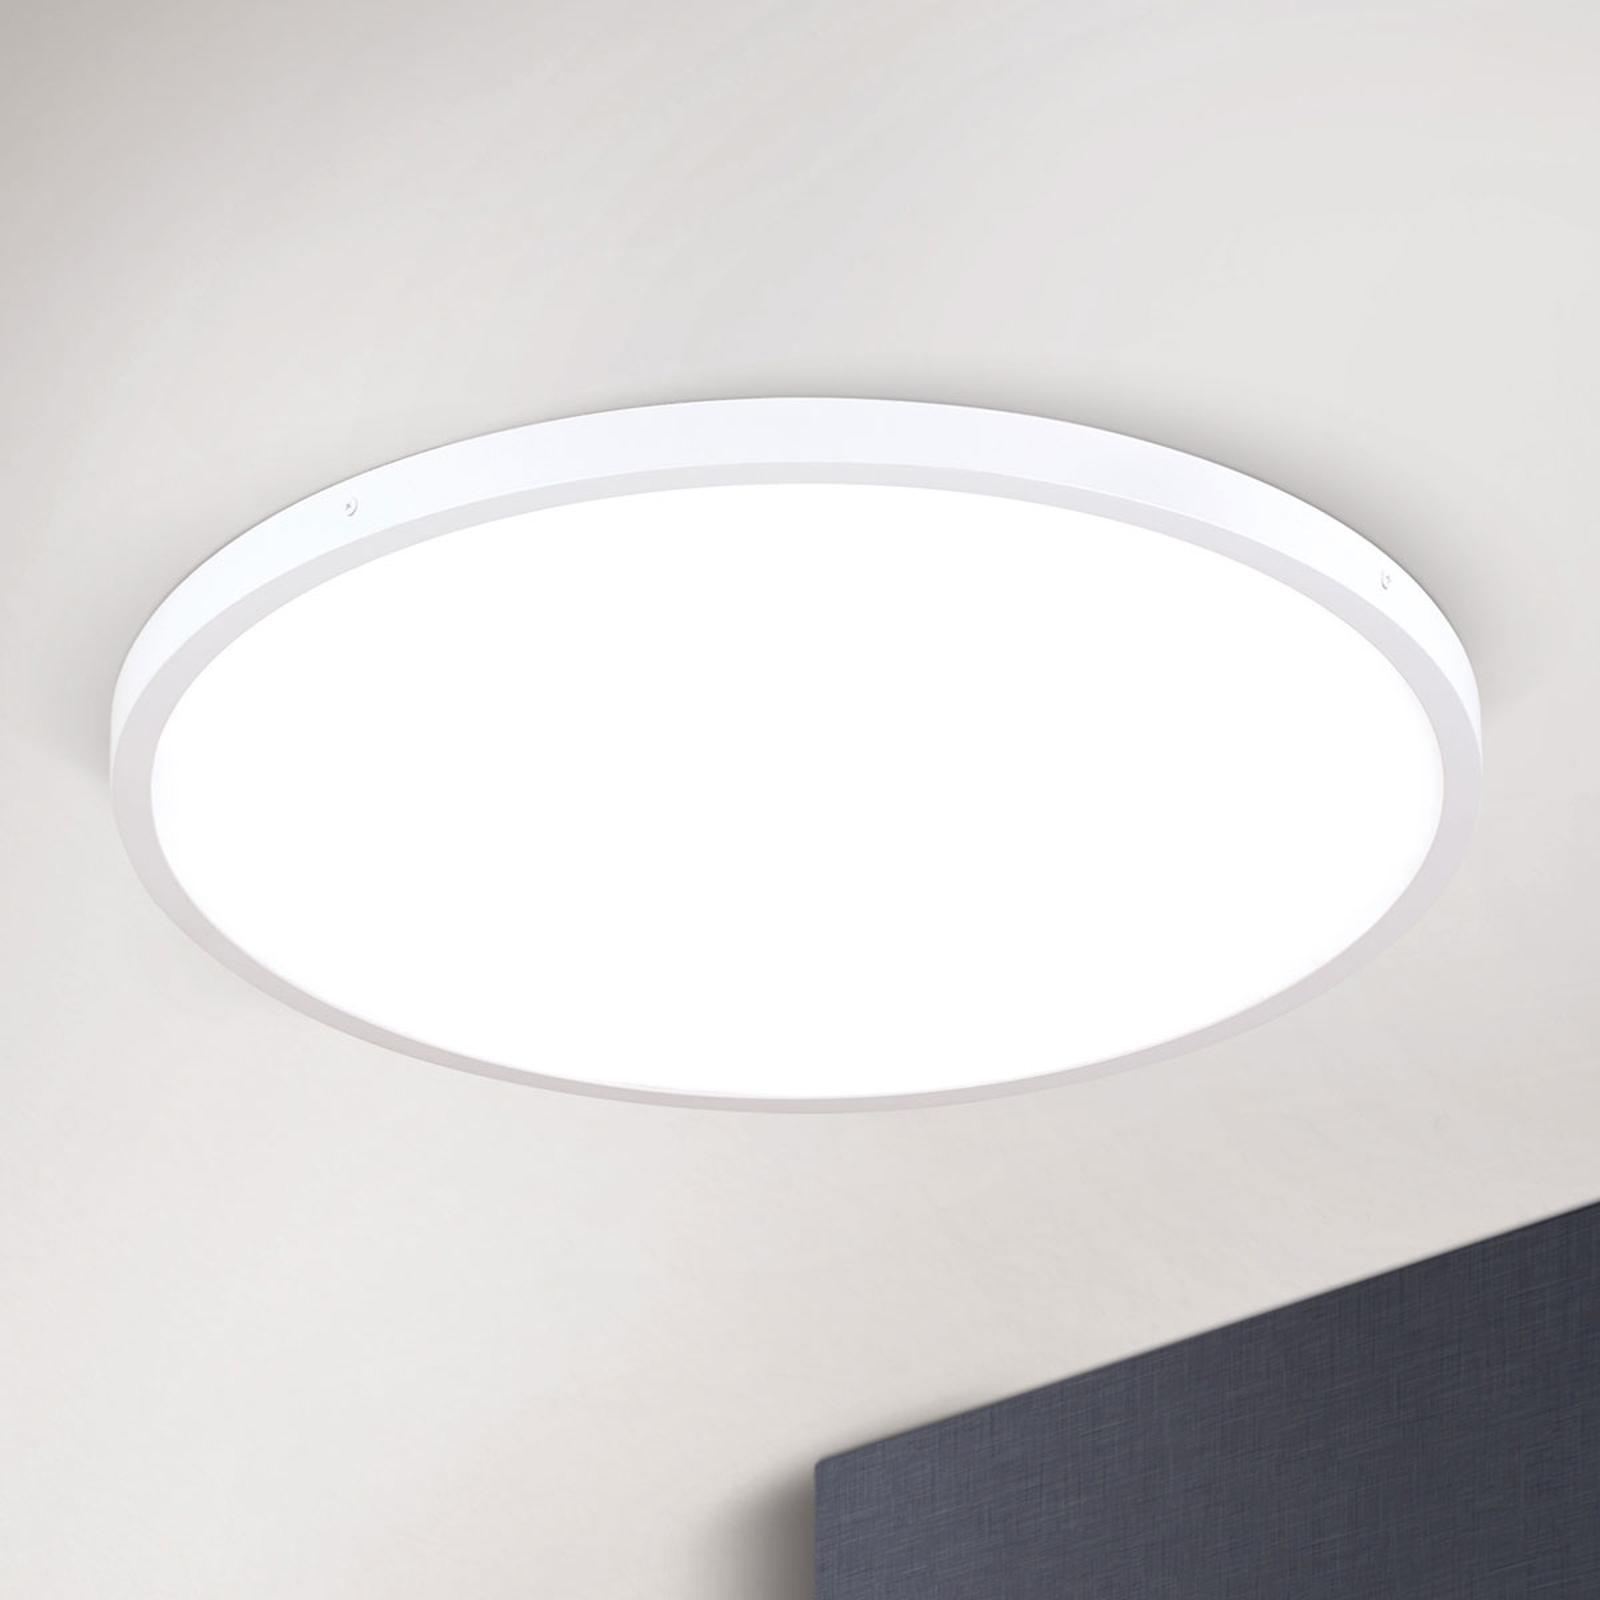 Ultrapłaska lampa sufitowa LED Lero Ø 60cm